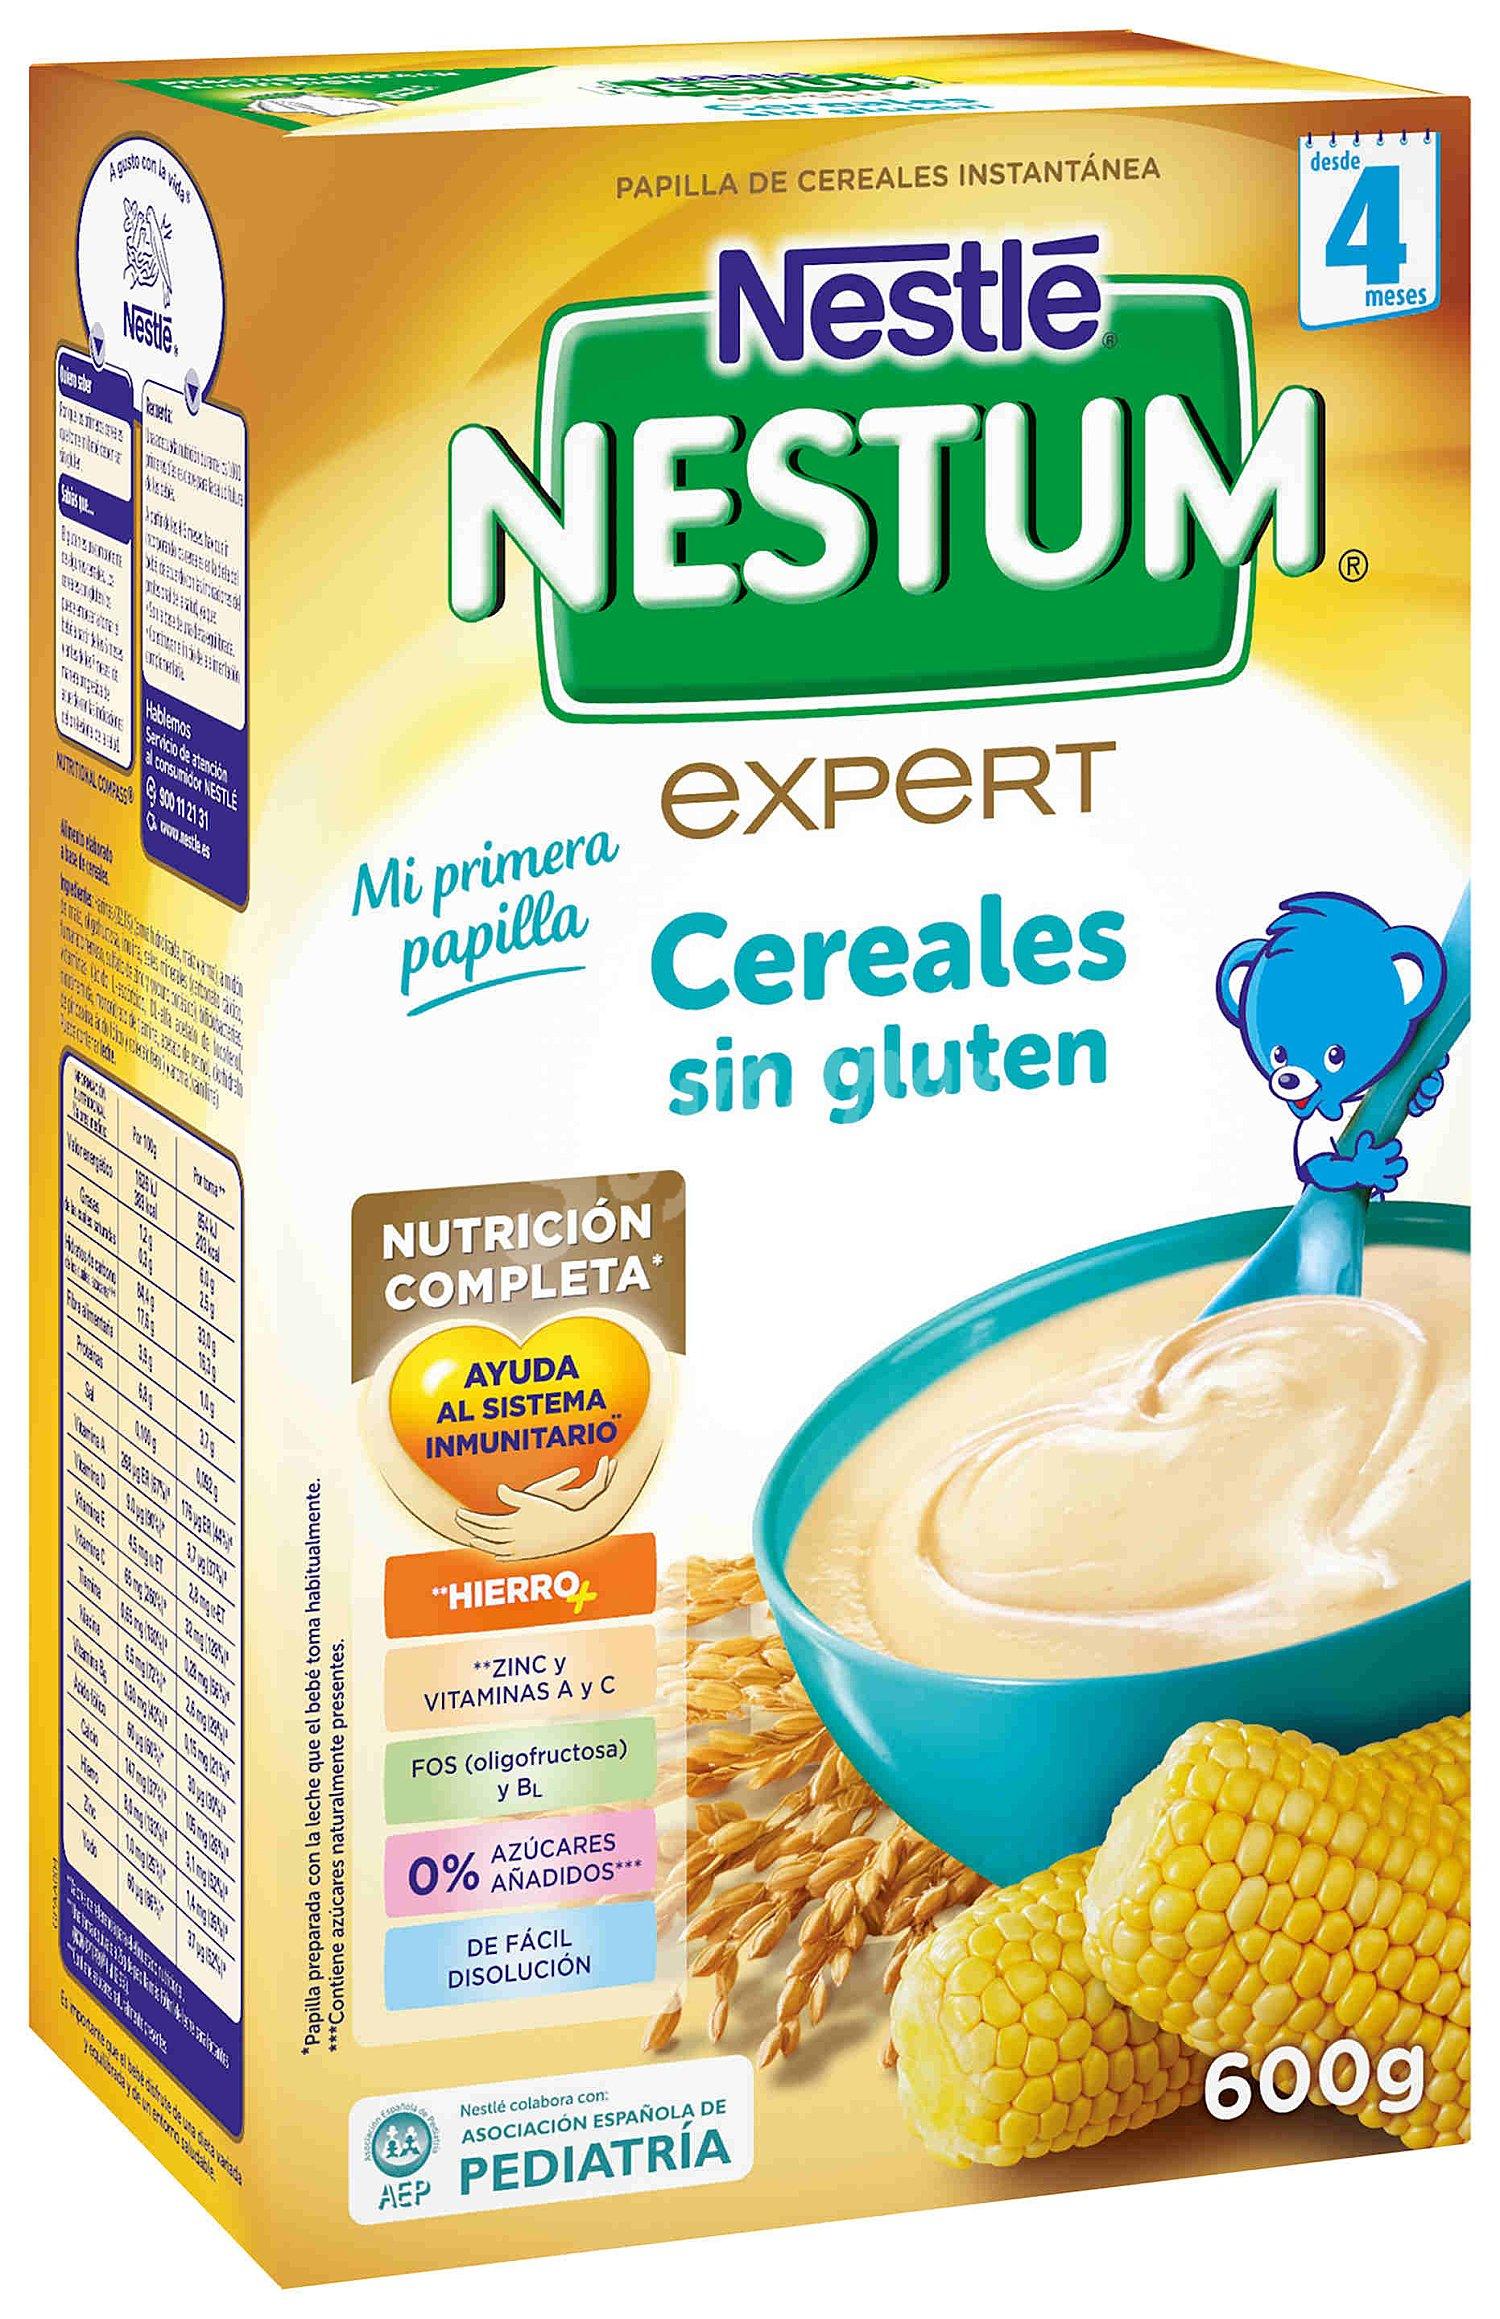 Nestum nestl papilla de cereales sin gluten a partir de 4 meses 600 gr - Cereales sin gluten bebe 3 meses ...